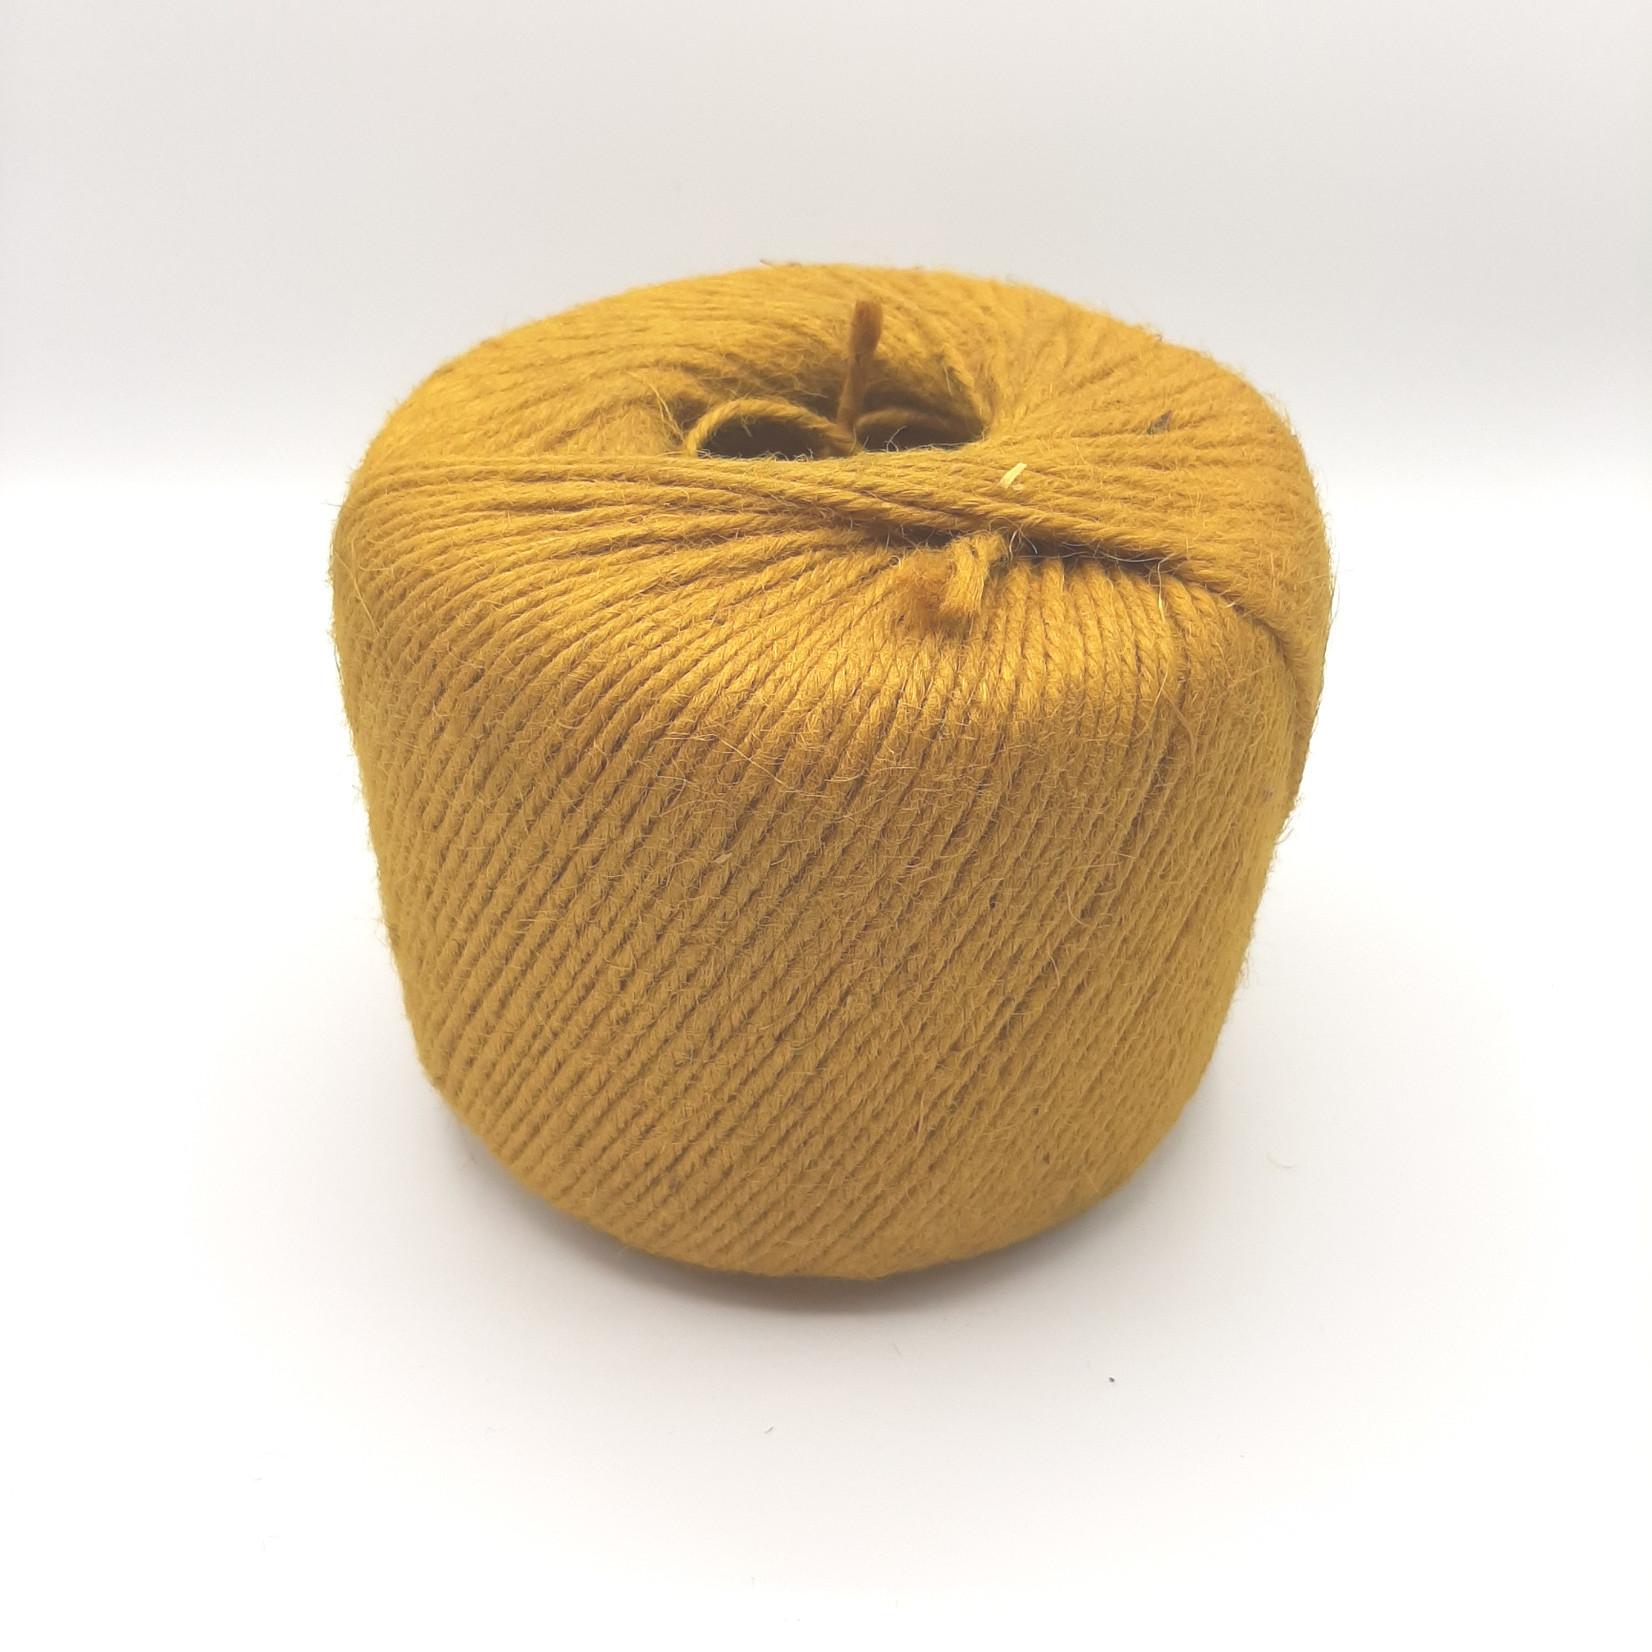 HollandWool Jute touw 1000 gr. = 400 m. - kleur oker - 2.5 mm. dik